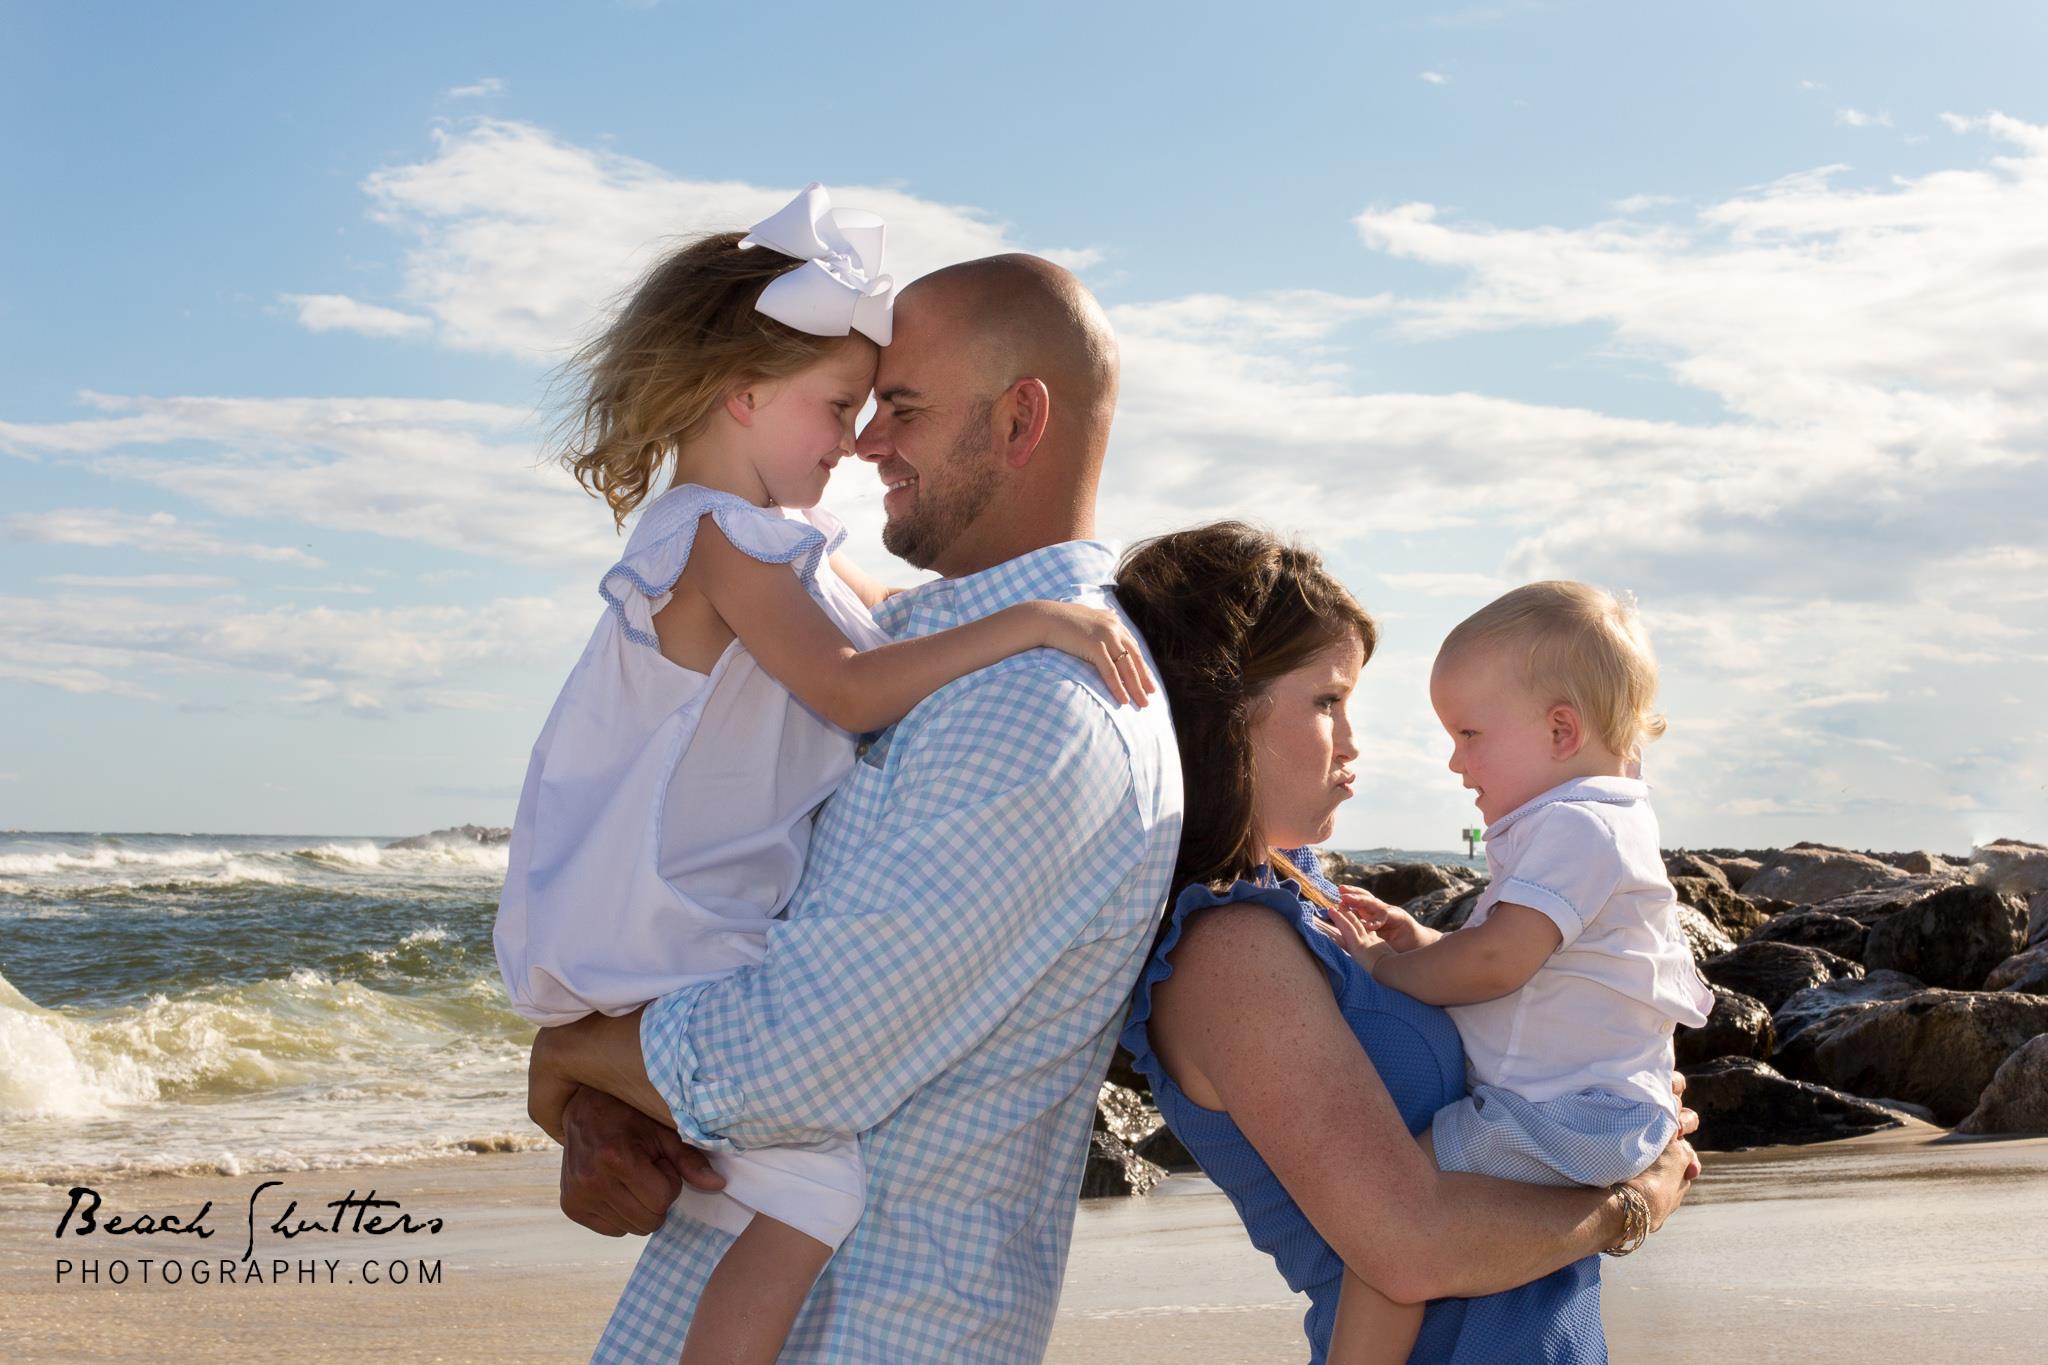 Orange Beach Alabama photography by Beach Shutters is fun